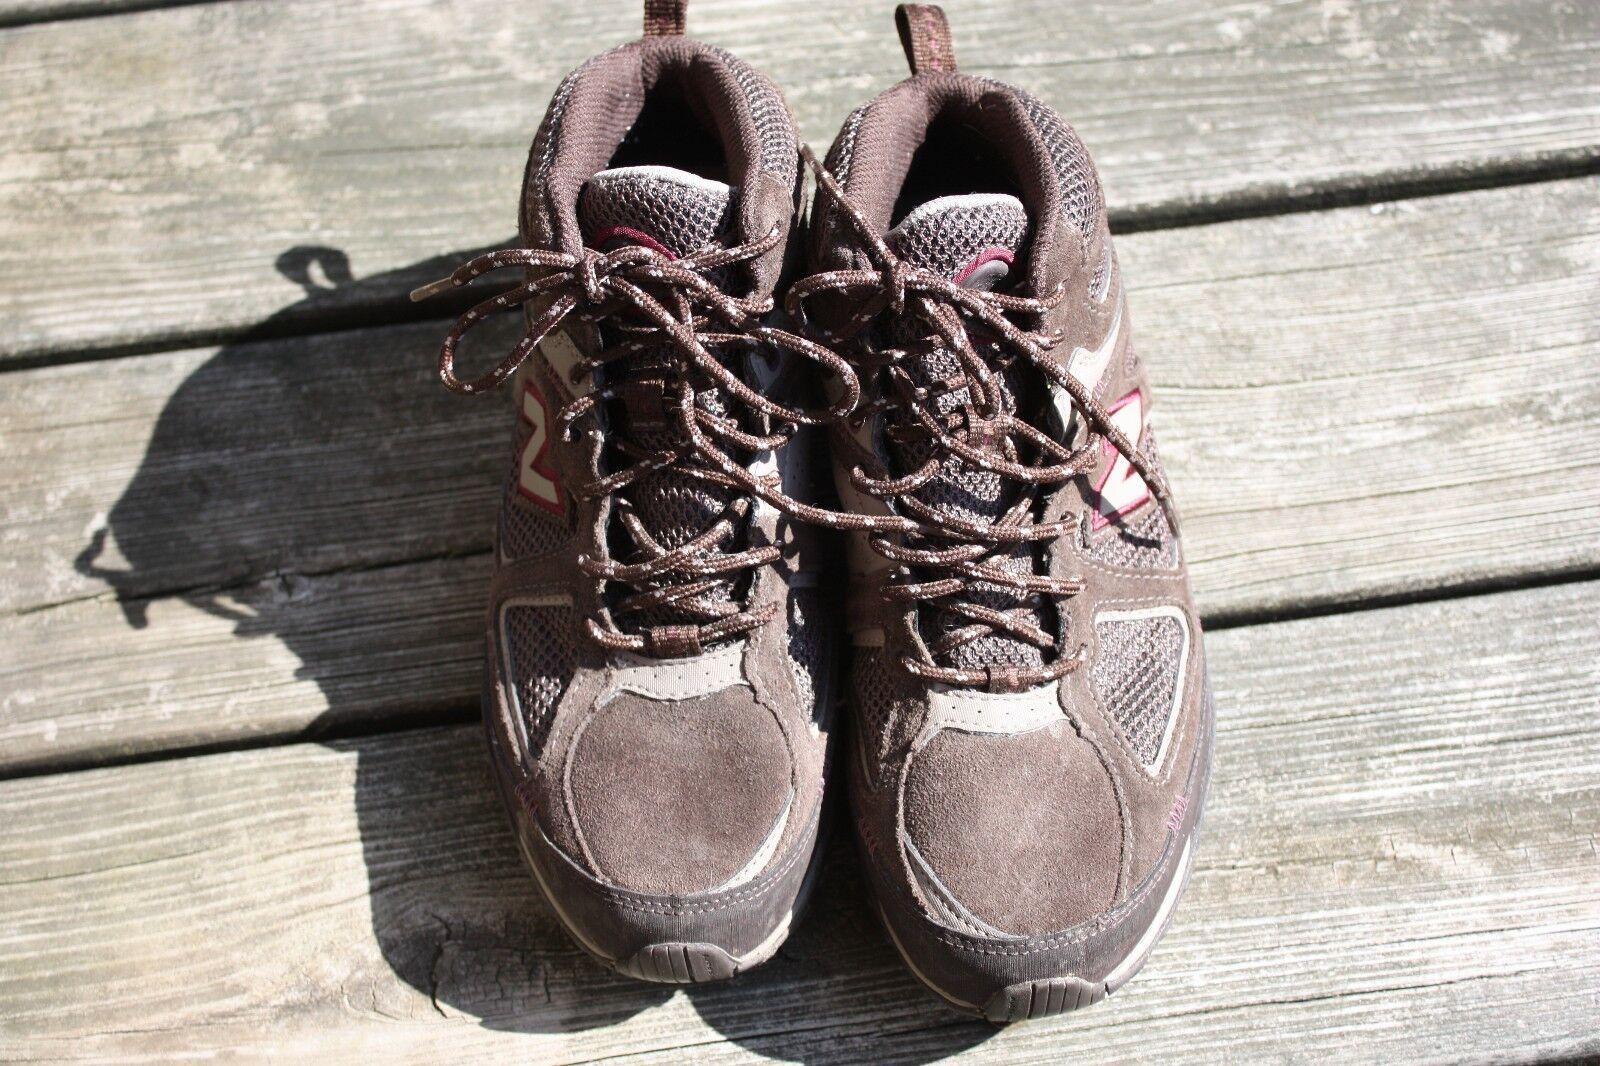 New balance W0900HGT Mujer Marrón Gor-Tex talla excursionista botas talla Gor-Tex 8 1 2 Usado En Excelente Condición 286cf9